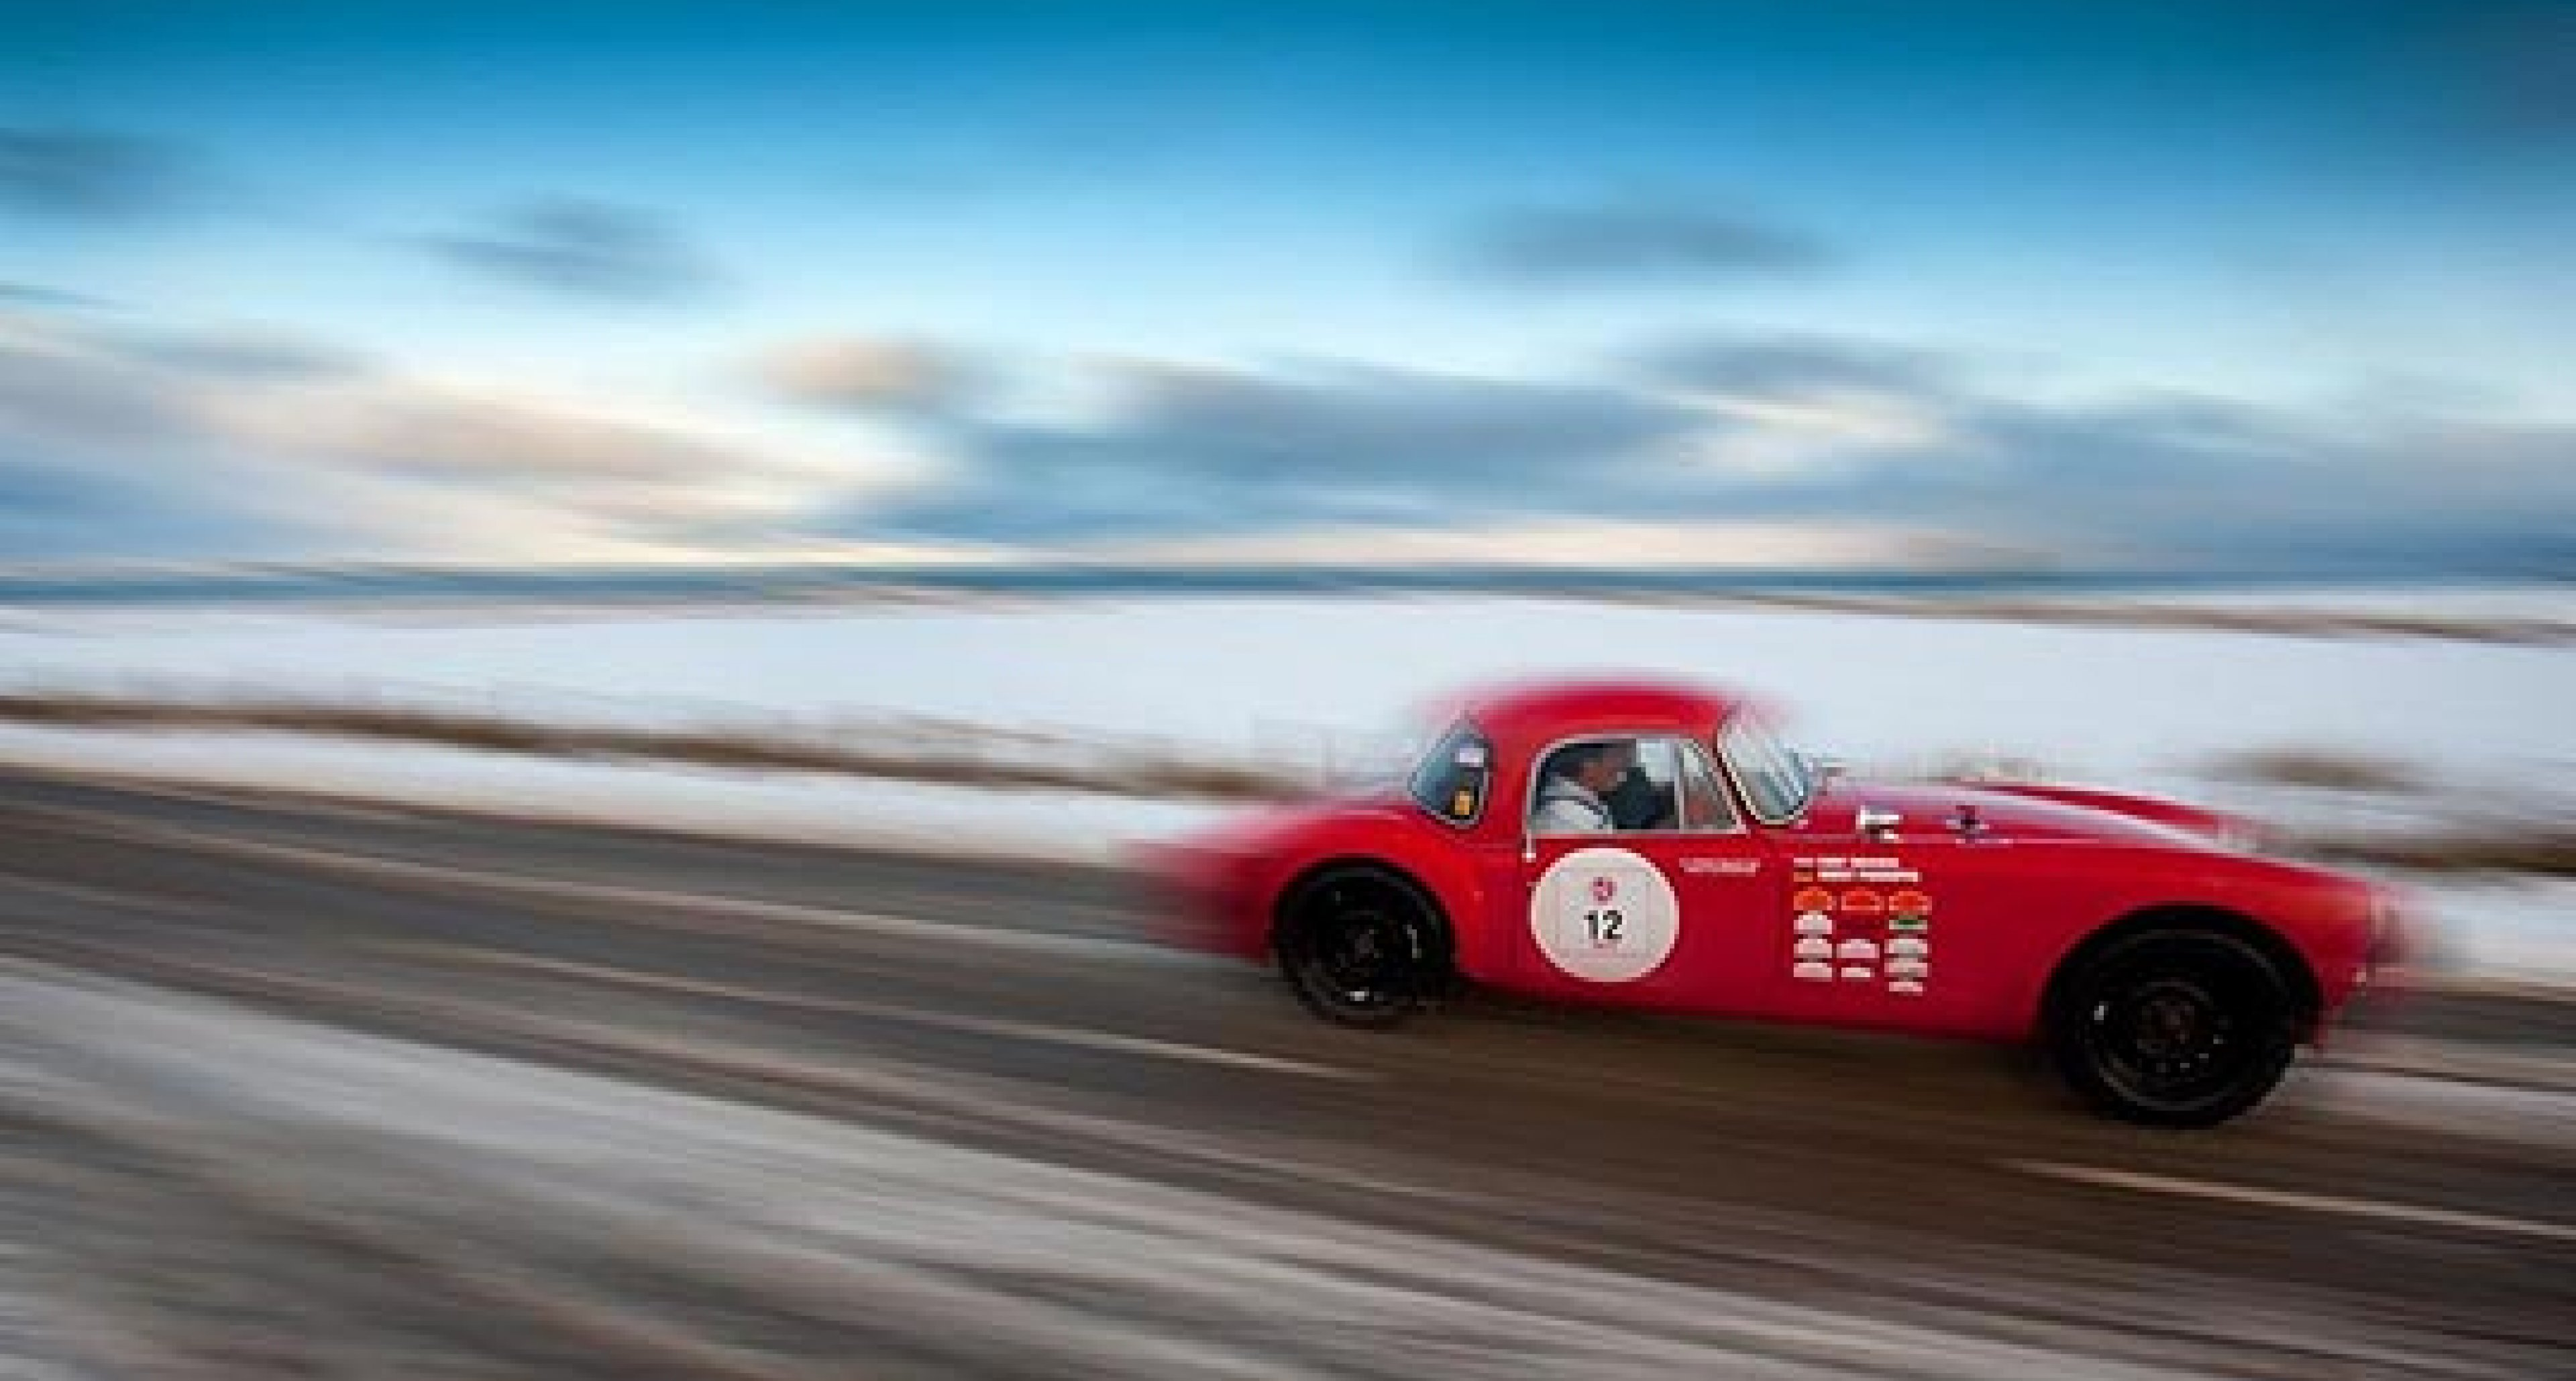 HERO: the Historic Endurance Rallying Organisation